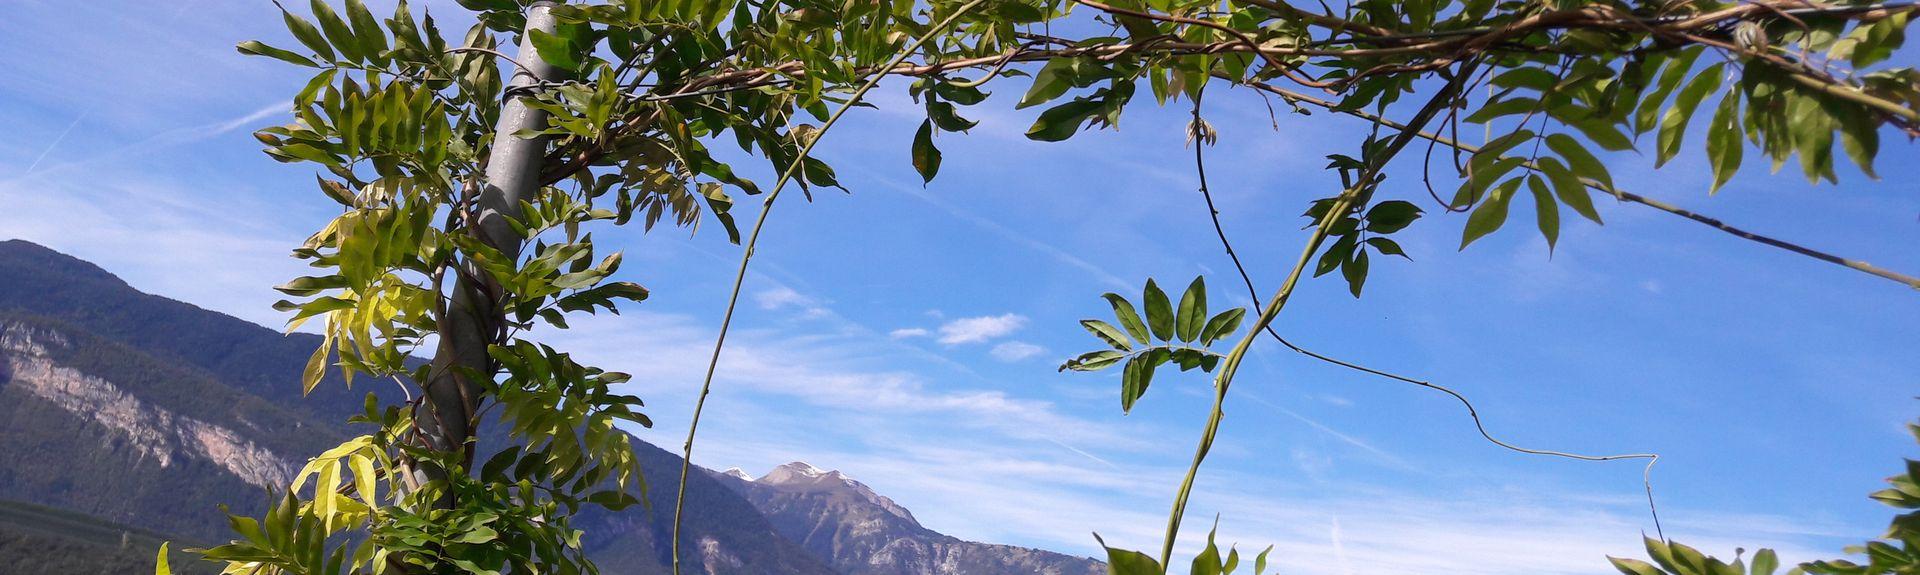 Gröna tornet, Trento, Trentino-Alto Adige, Italien